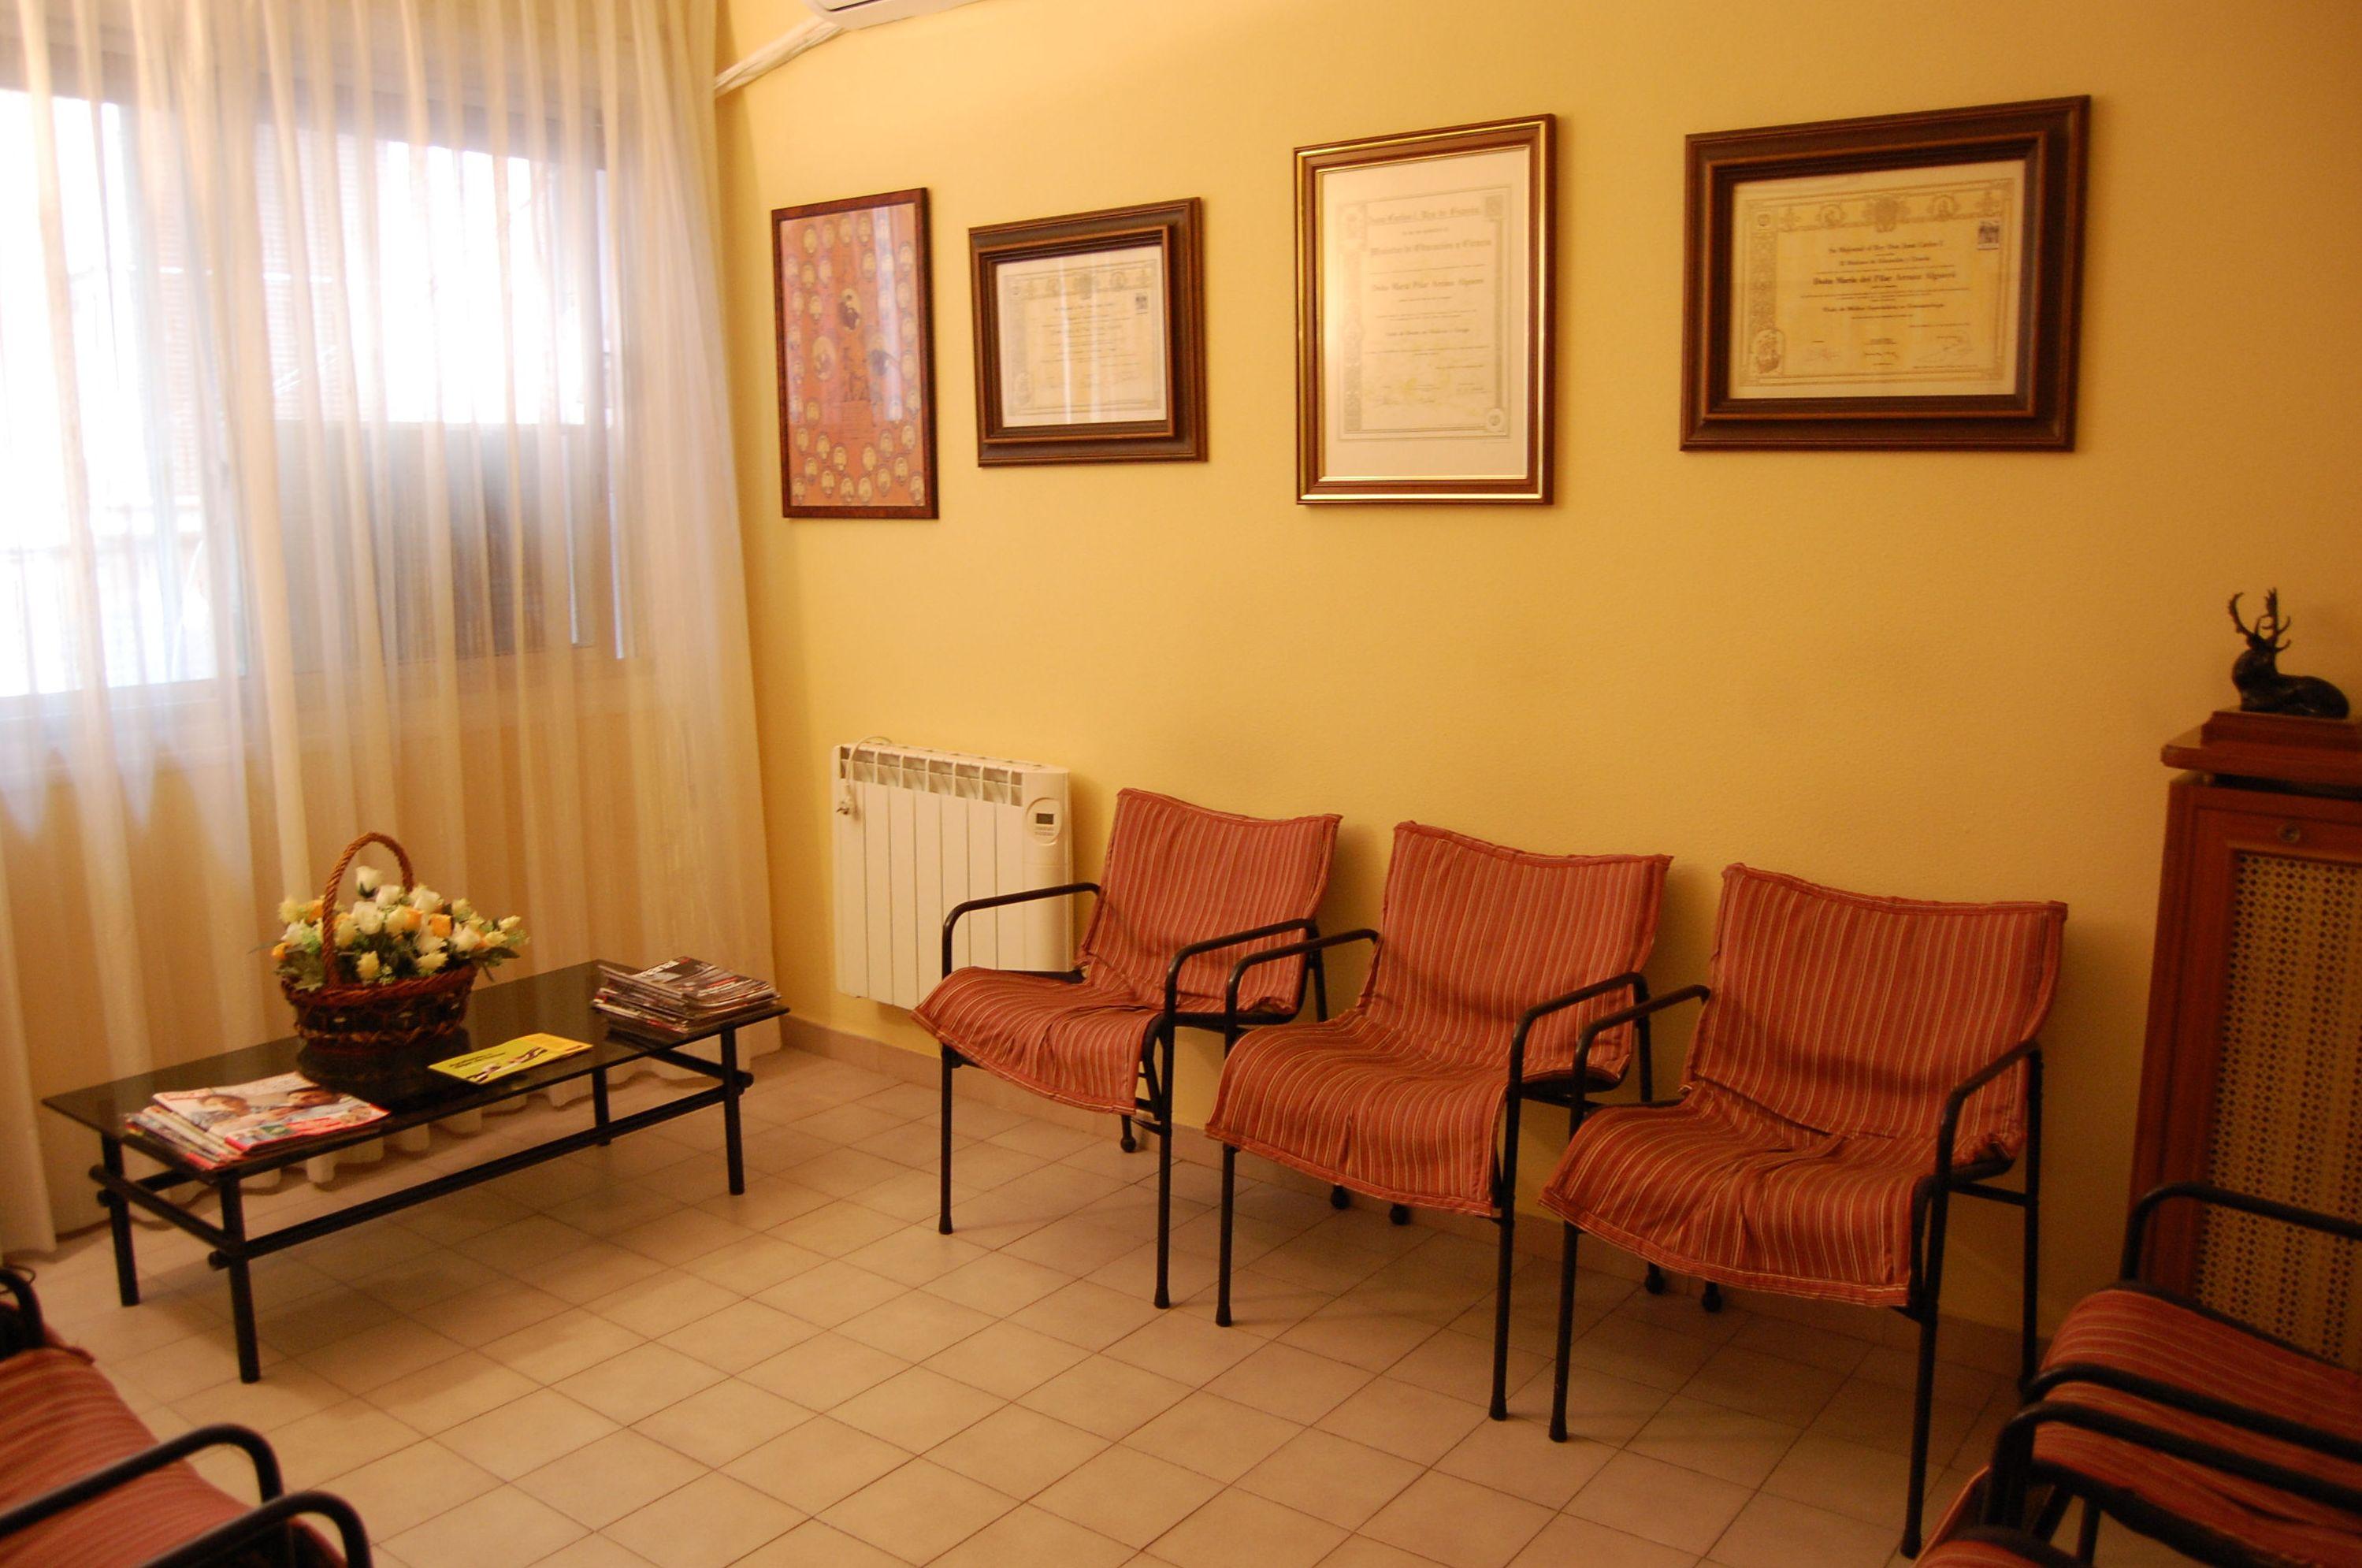 Sala de espera de la clínica dental en Zaragoza